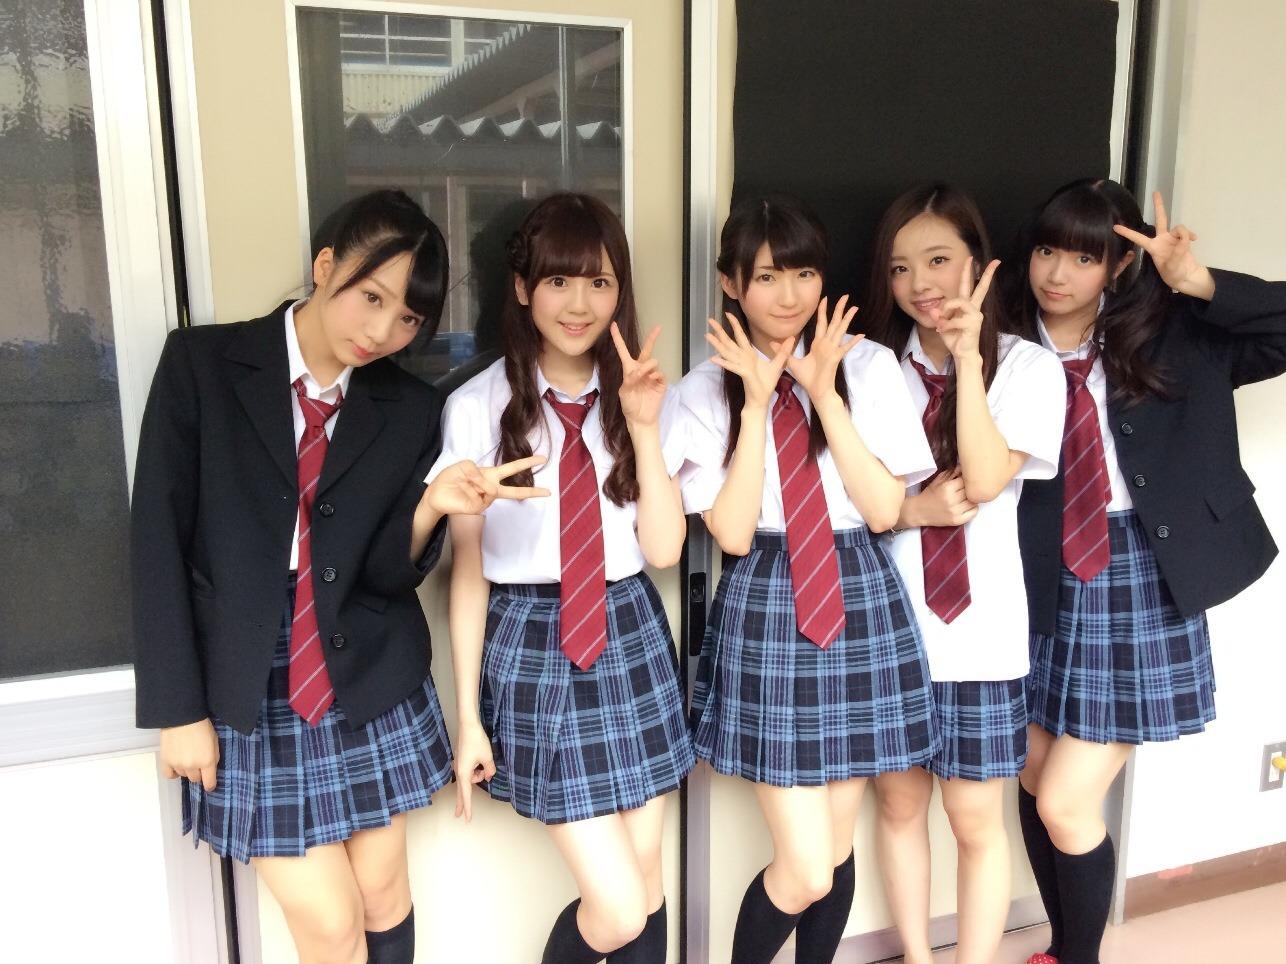 A-Pop Idols 59014   Yamato Rina : Nogizaka46   大和里菜 : 乃木坂46